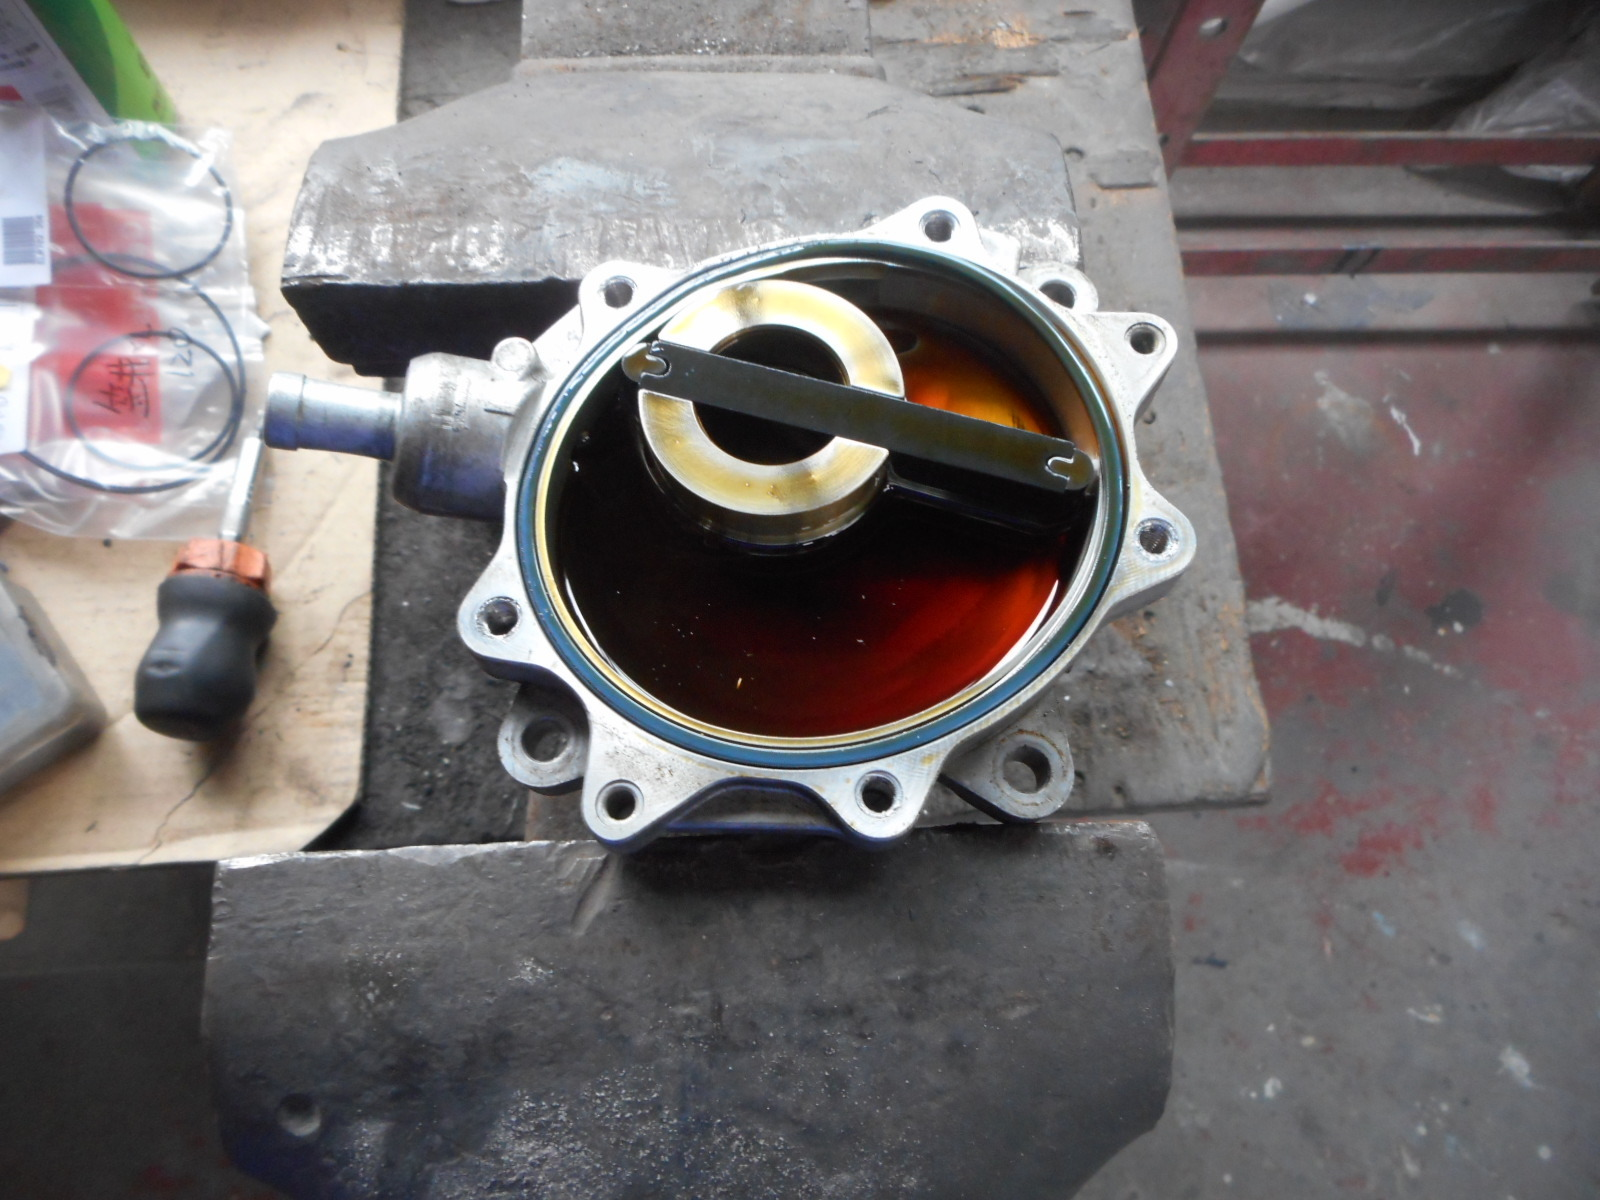 BMW 116i エンジンオイル漏れ修理(タペットカバー、バキュームポンプ)_c0267693_17431758.jpg